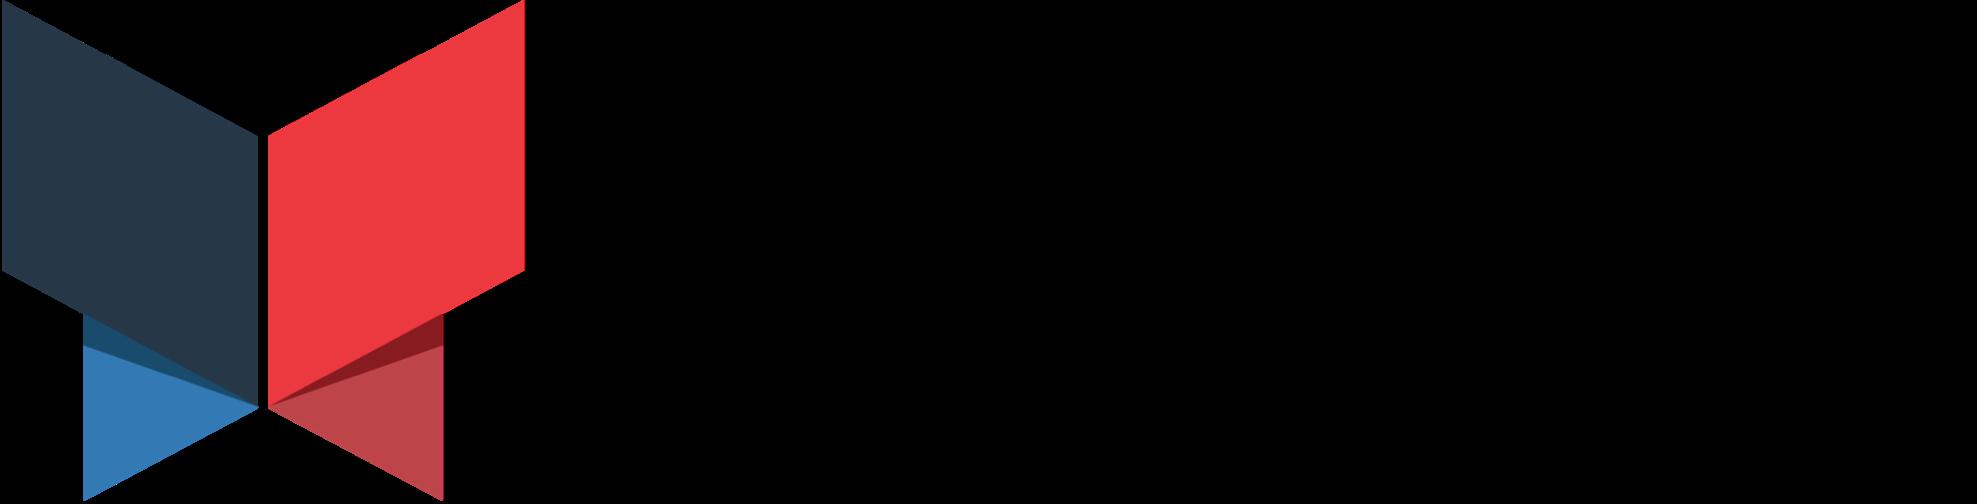 Suprabook_Logo_Horizontal_OnClear.png